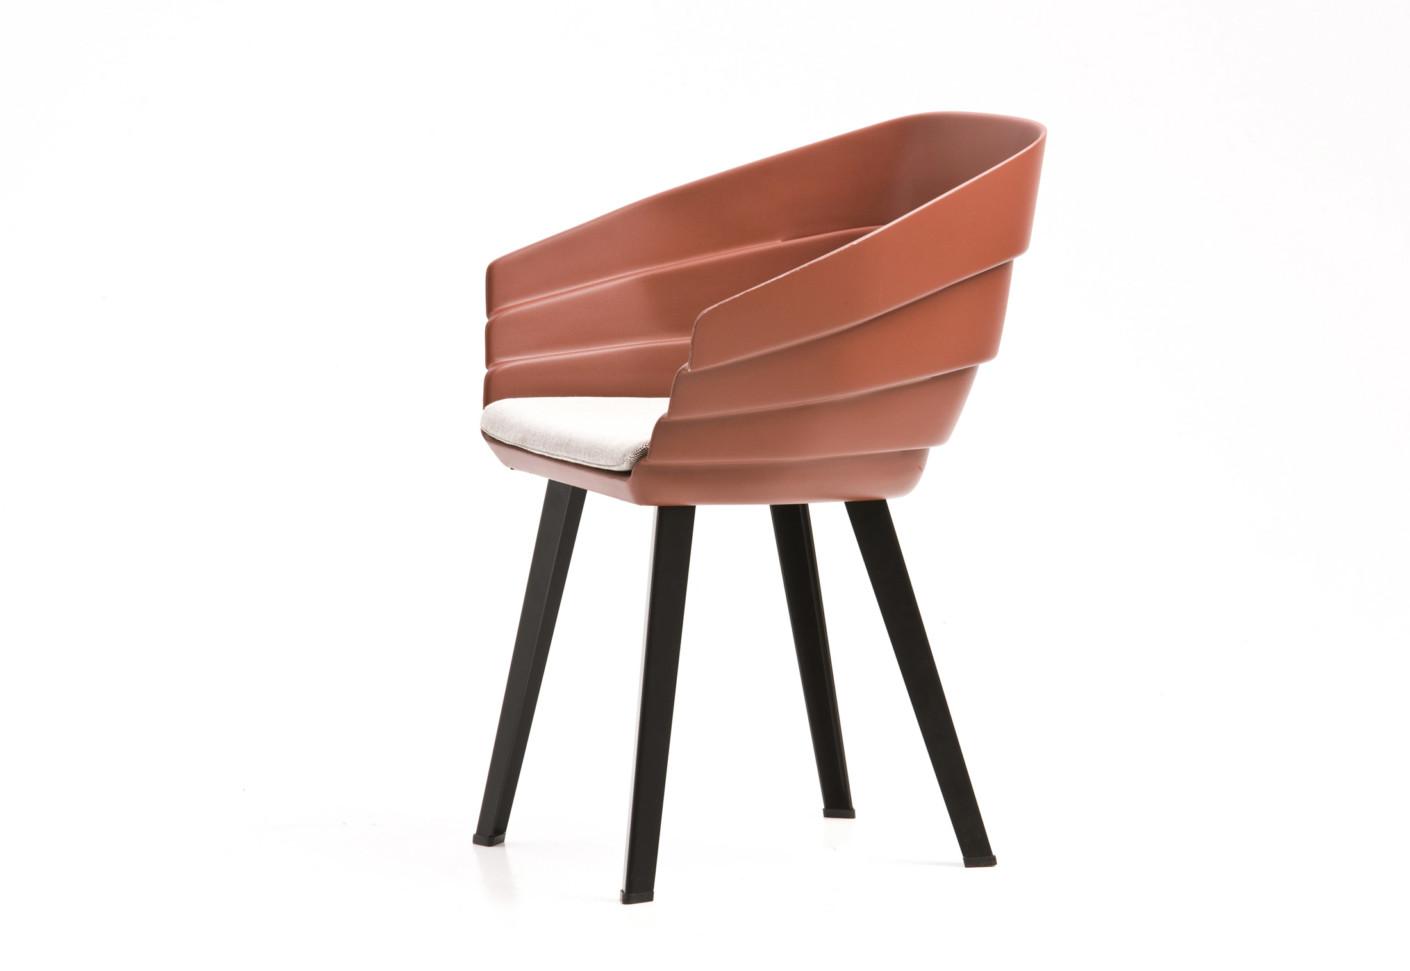 swing chair patricia urquiola clam ice fishing rift by moroso stylepark